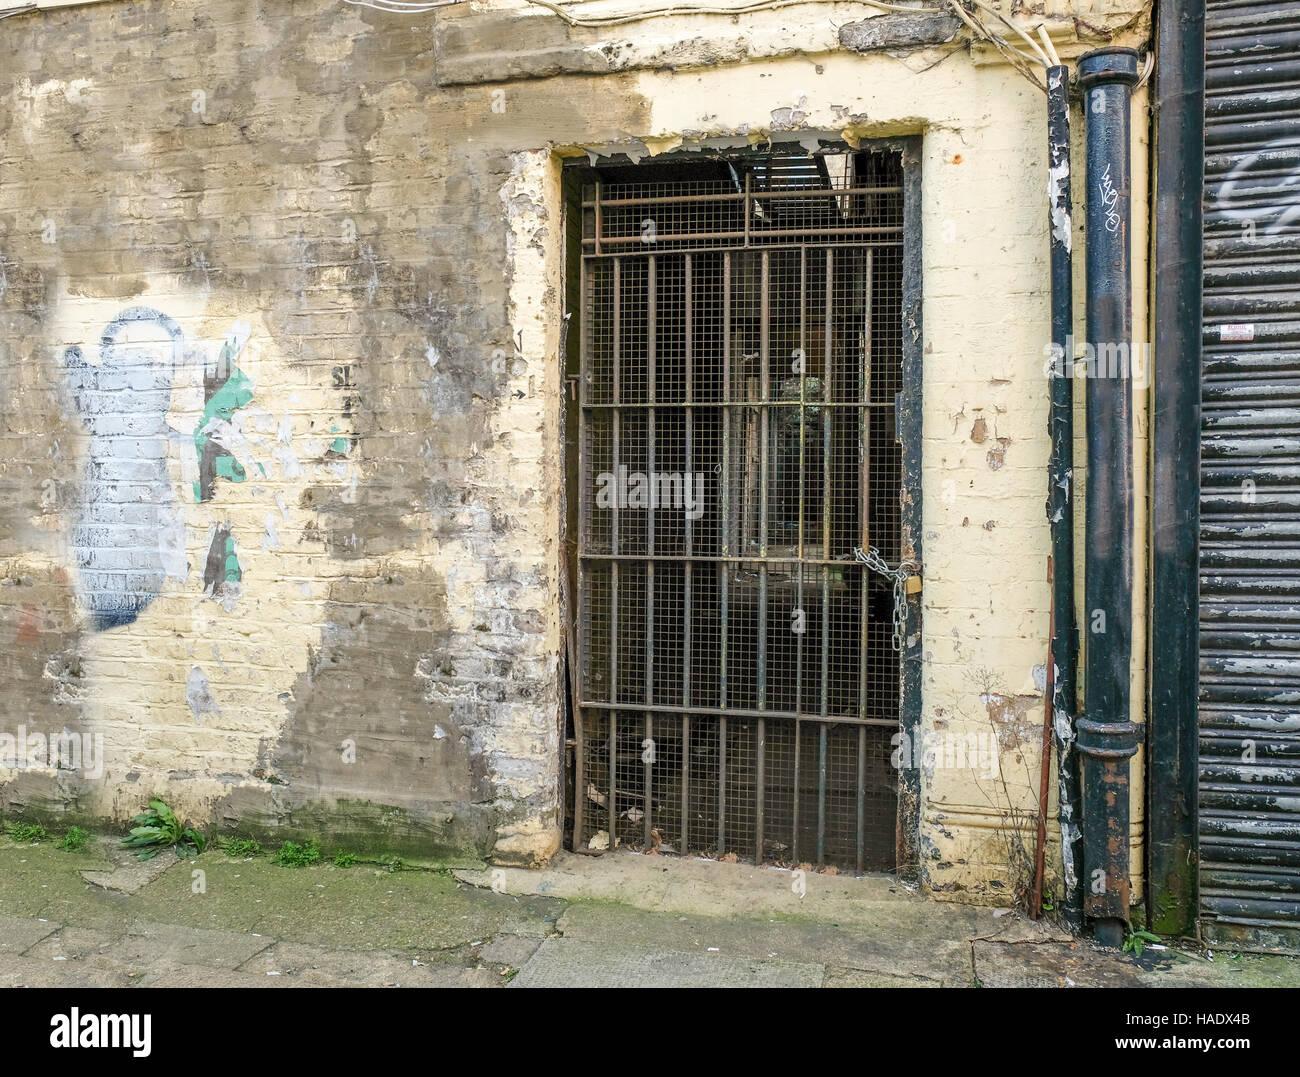 Old metal barred and grilled door way forgotten and abandoned & Old metal barred and grilled door way forgotten and abandoned ... Pezcame.Com